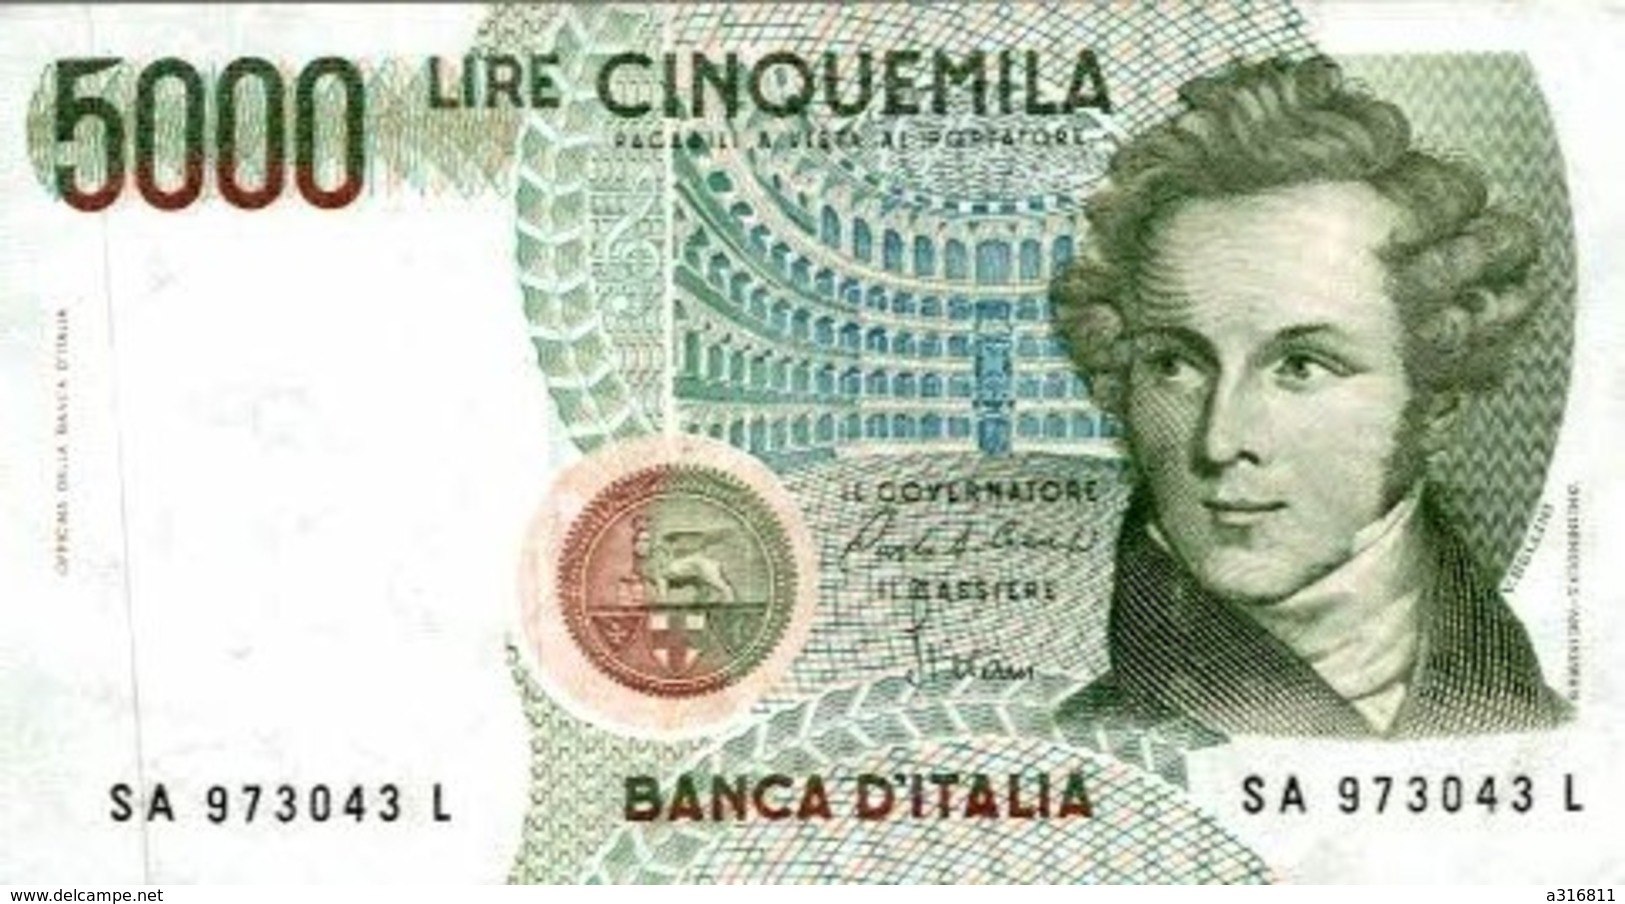 5000 LIRE CINQUEMILA - Non Classés